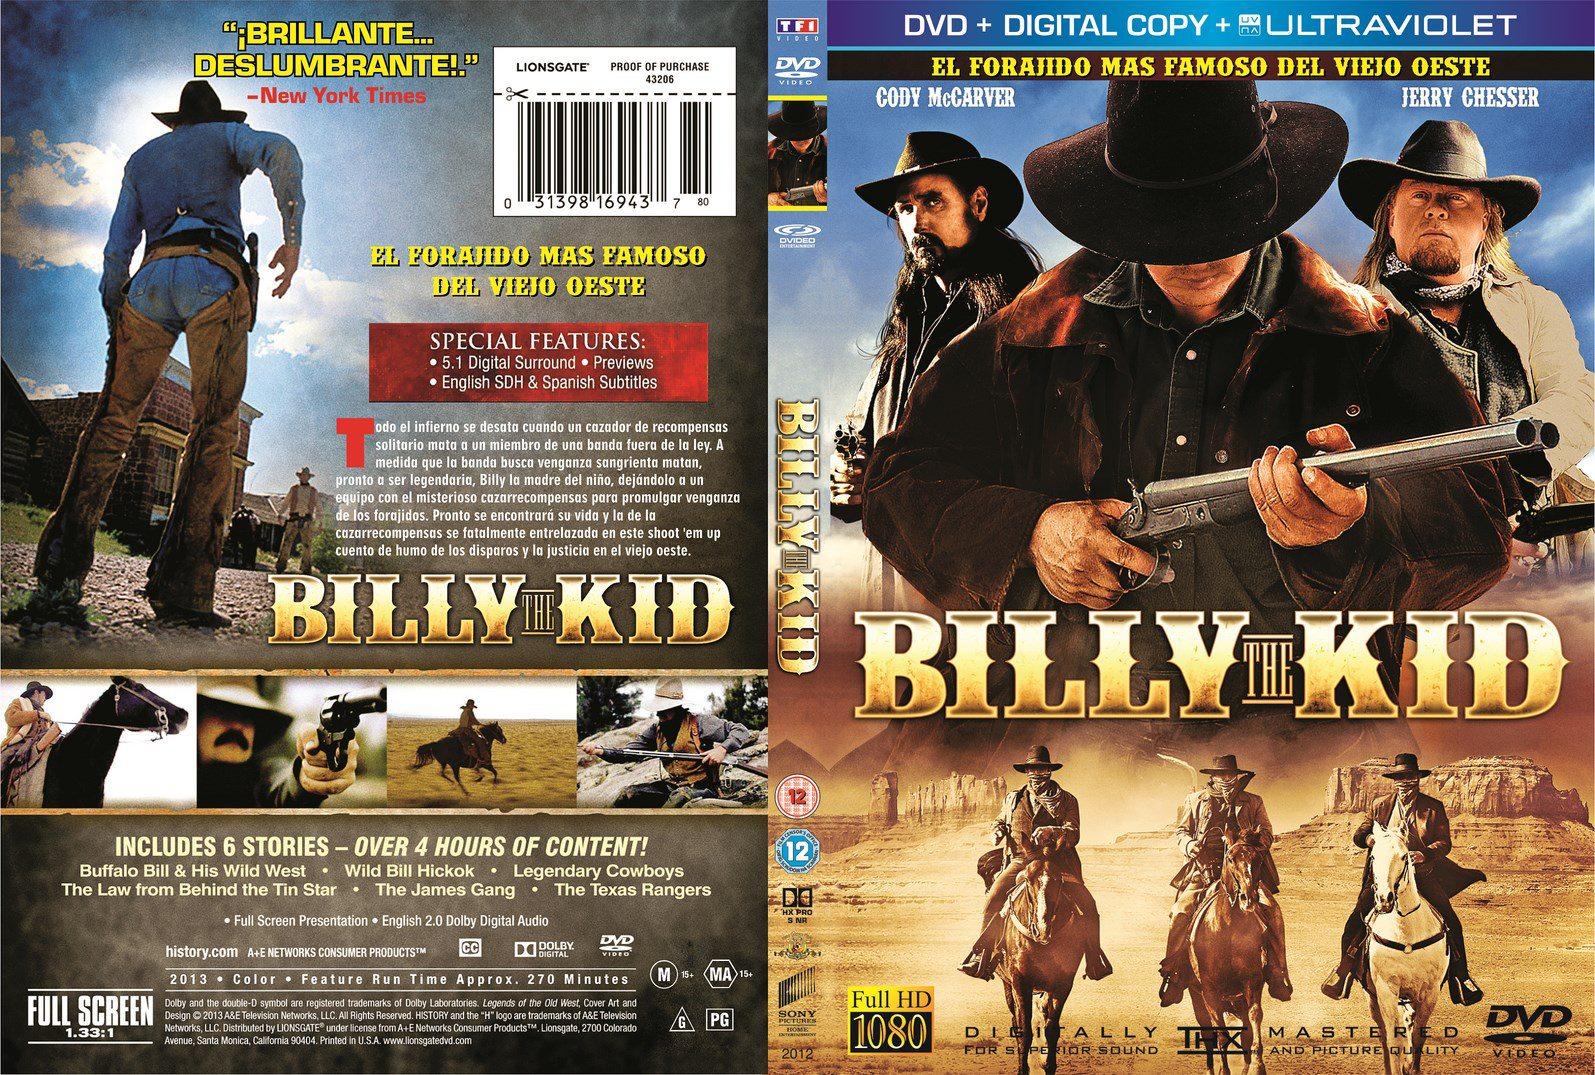 Billy casino kid rim rock casino